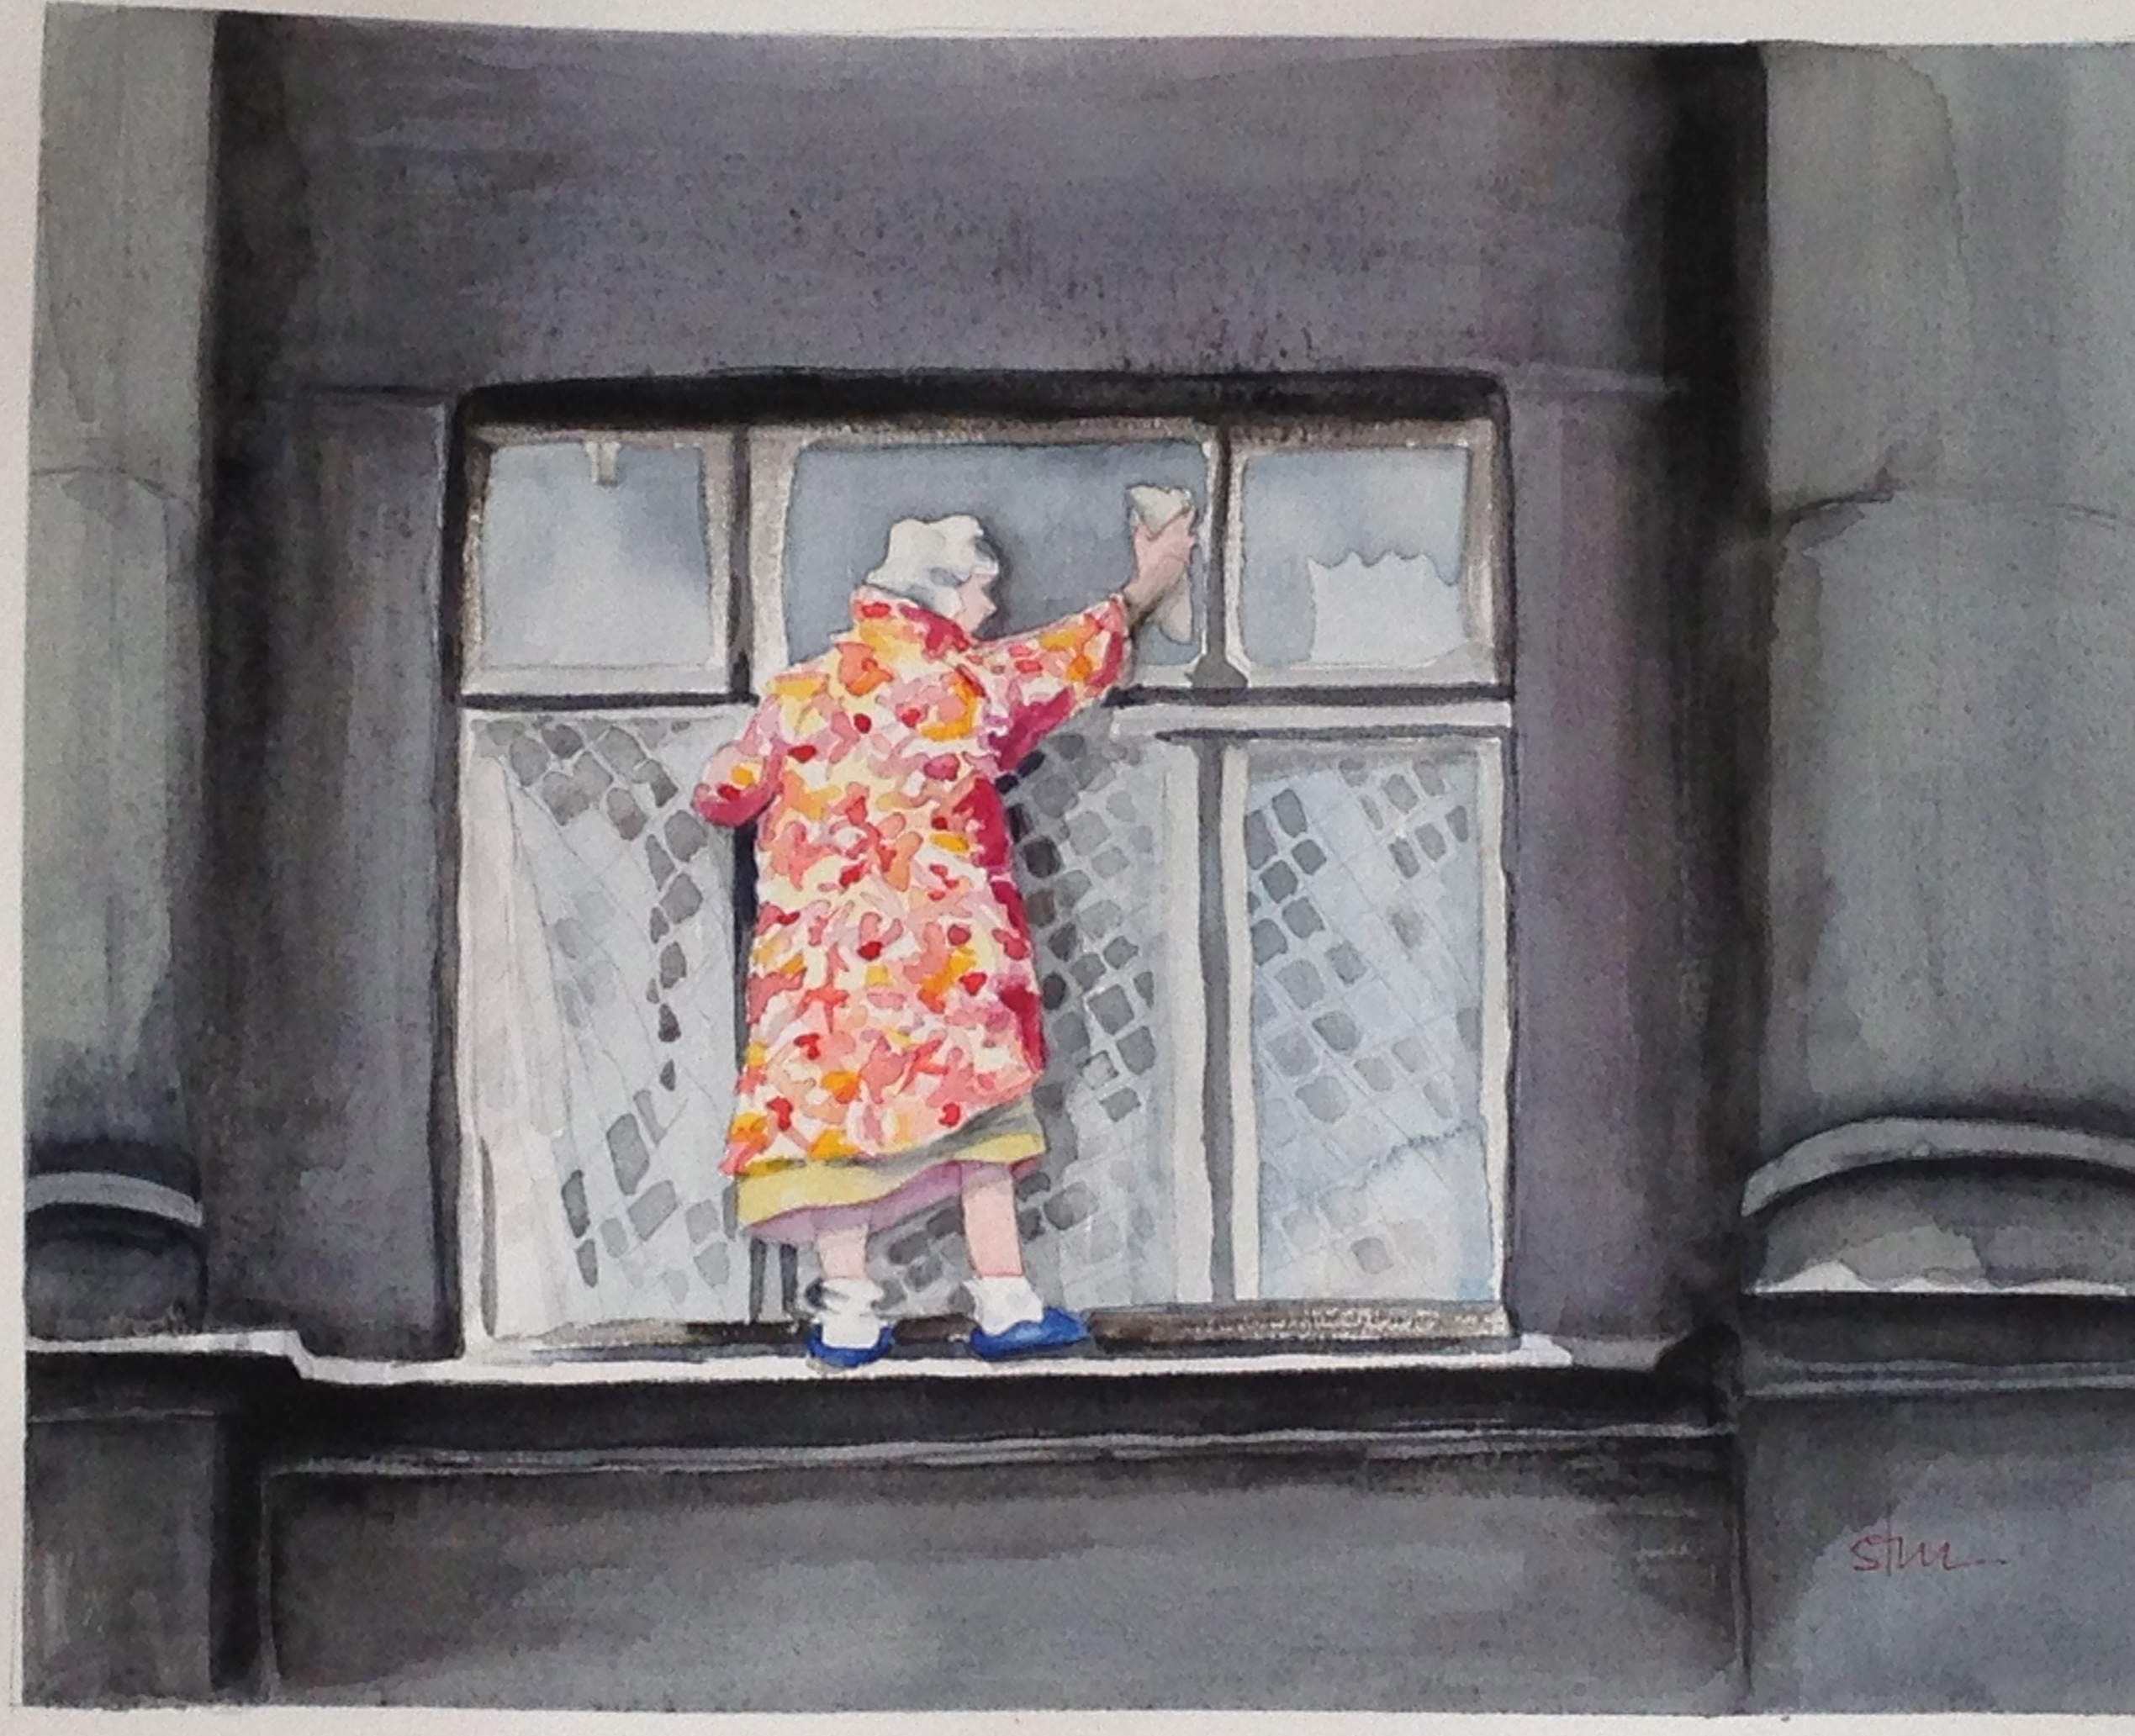 Most Daring Window Washer